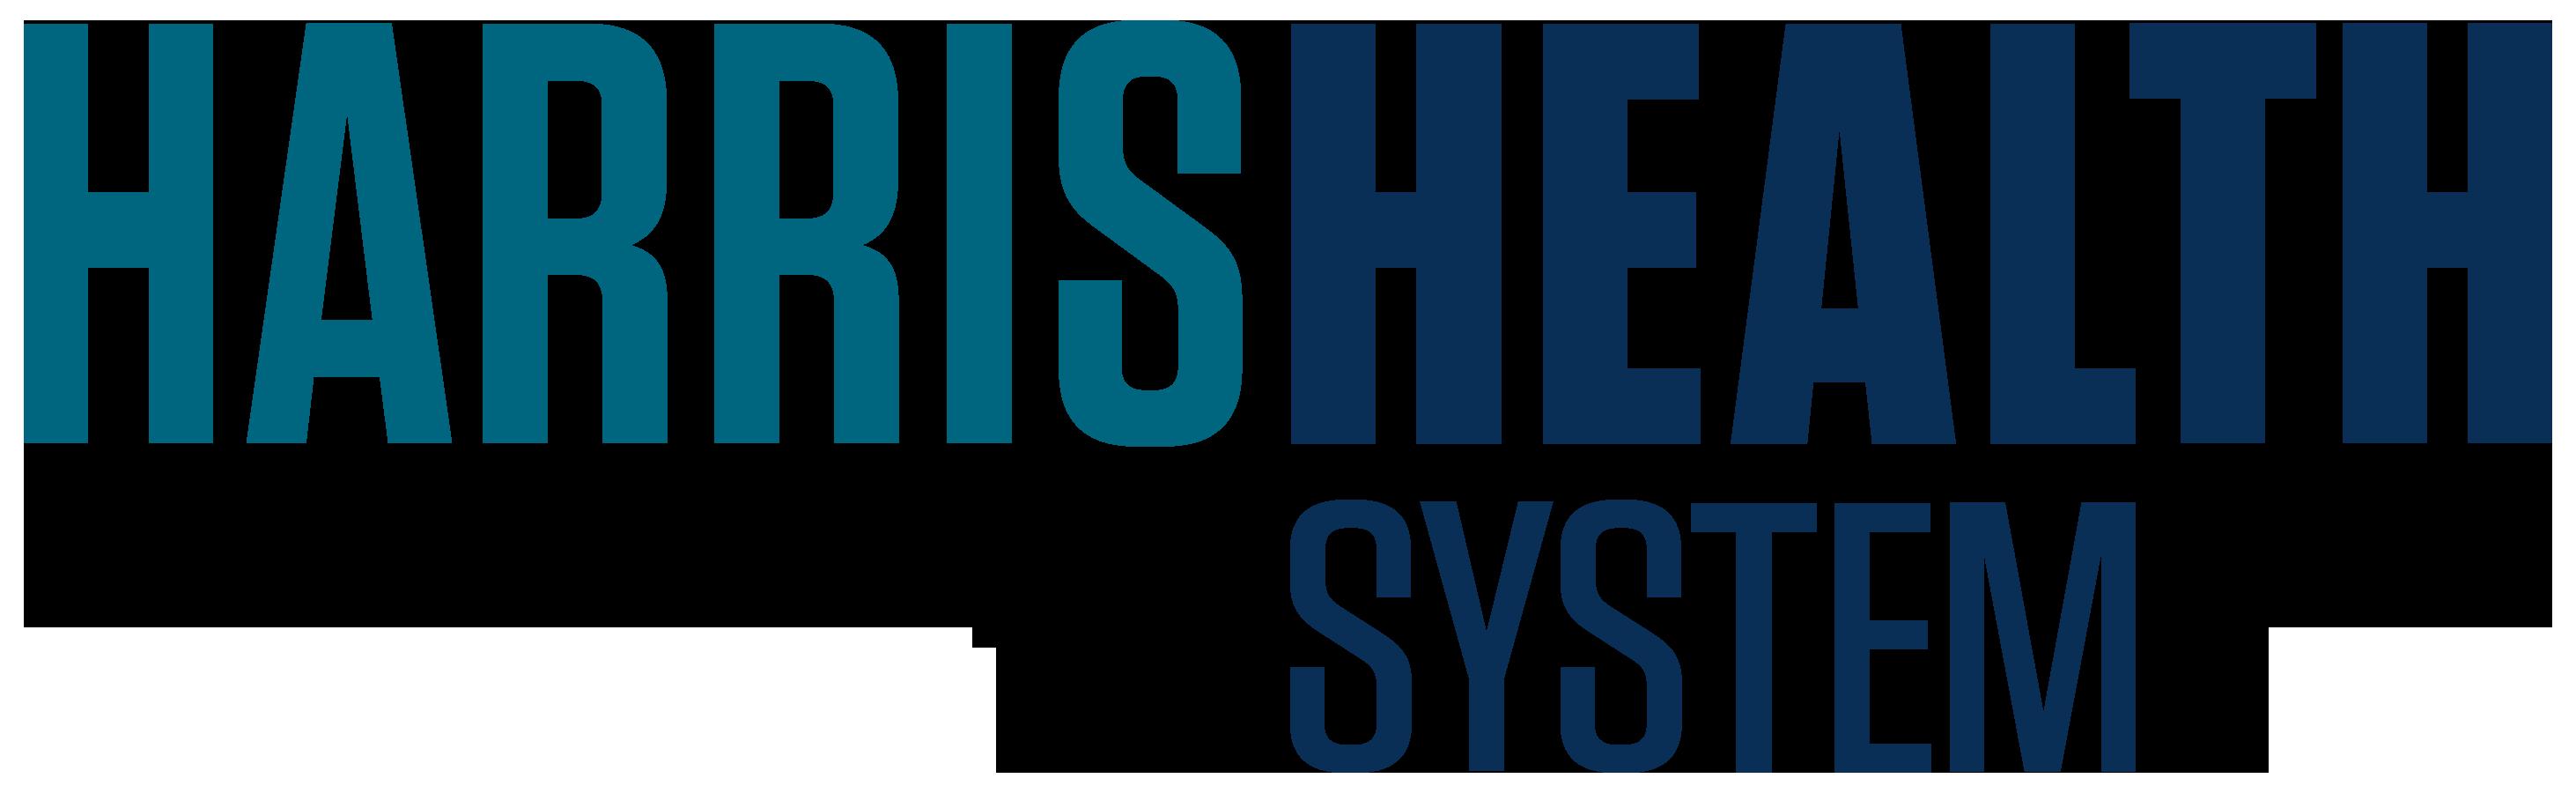 Harris Health System logo